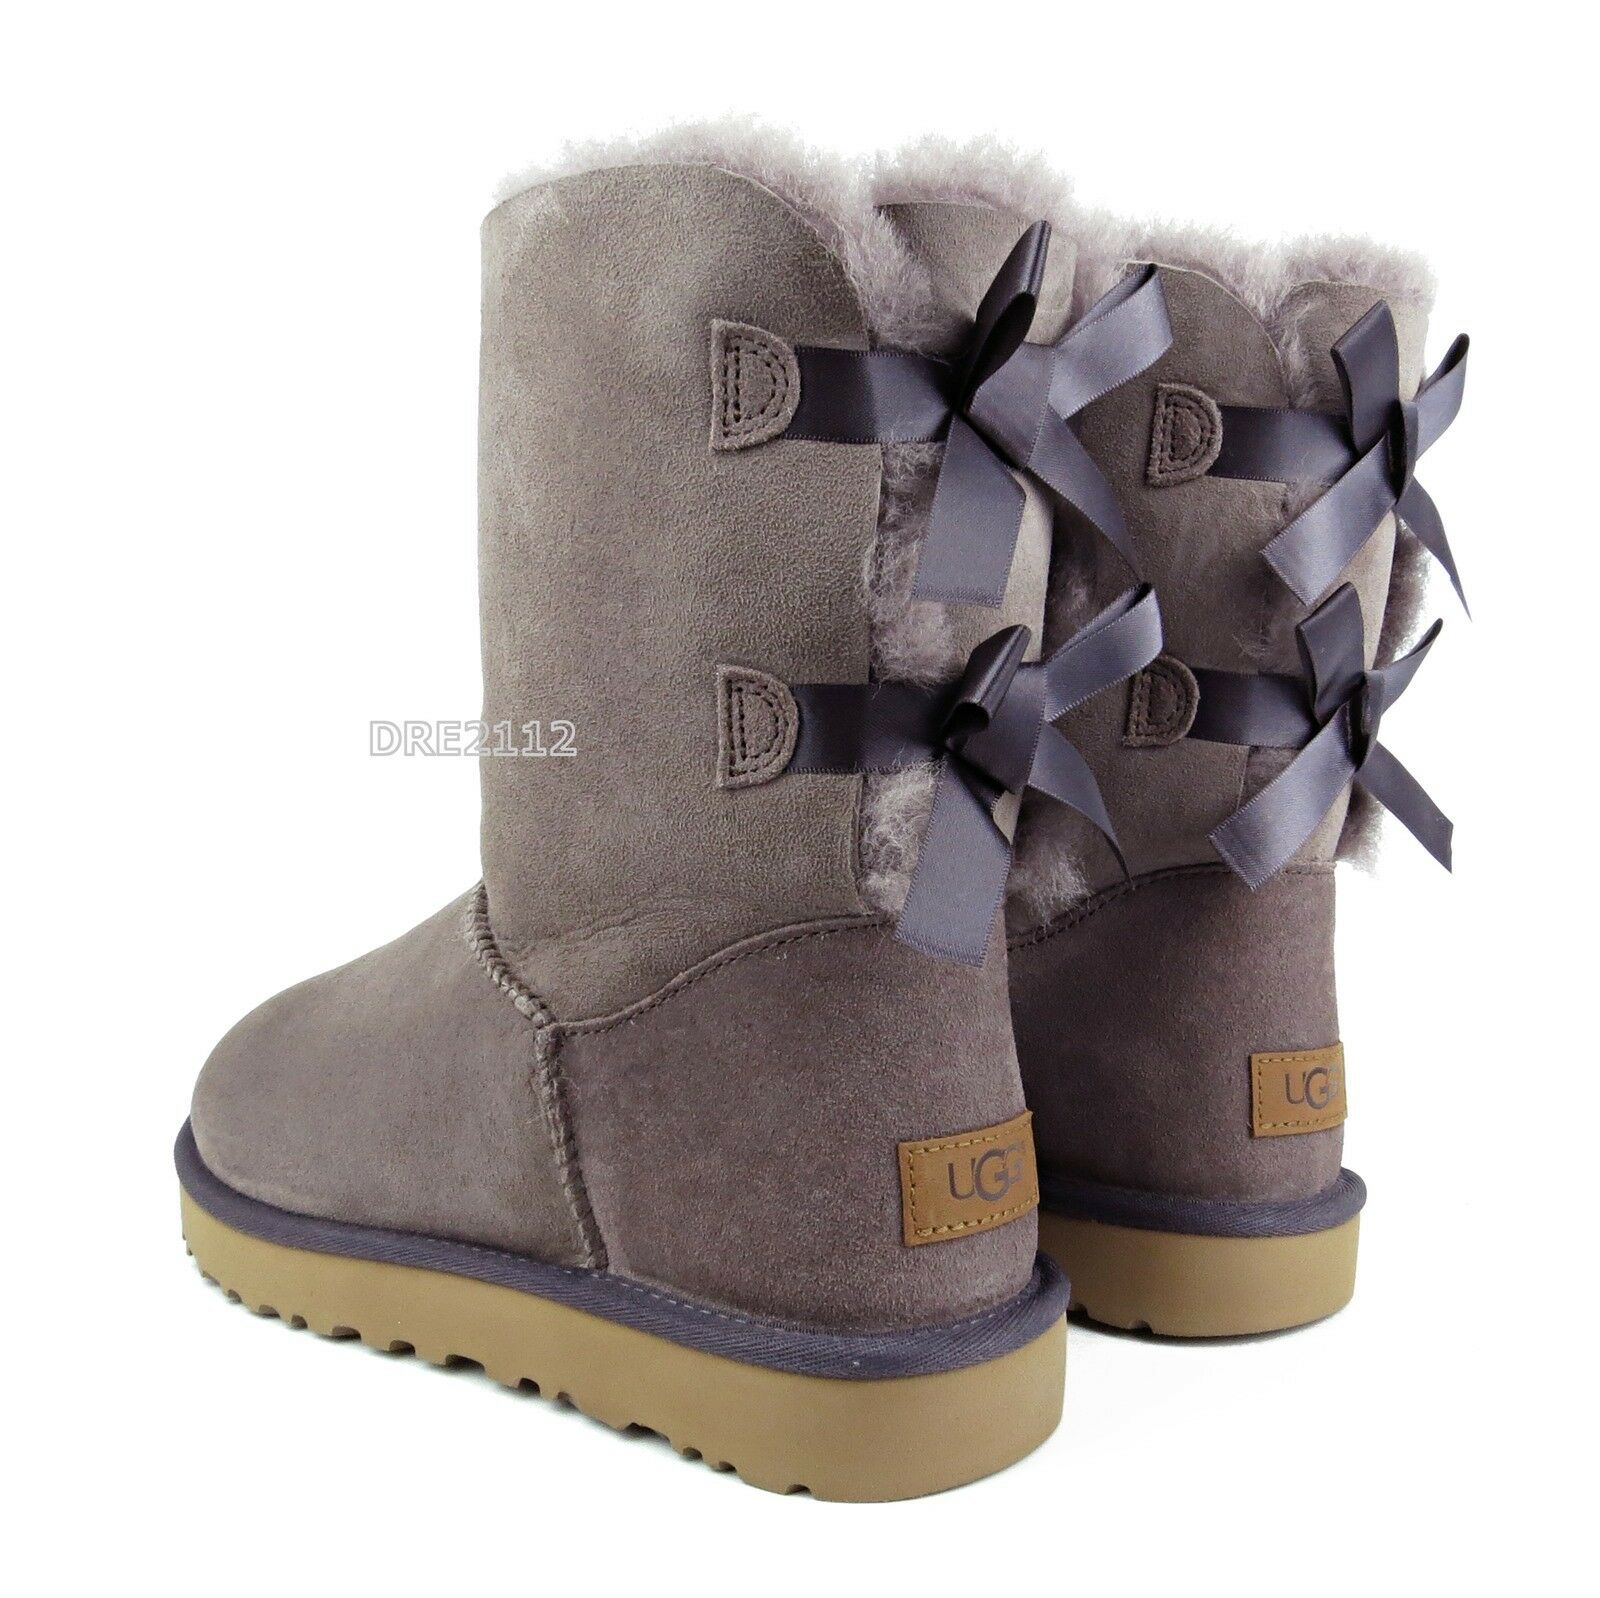 07511b4e0e7 UGG Bailey Bow II Stormy Grey Suede Fur Boots Womens Size 8 ~NIB~